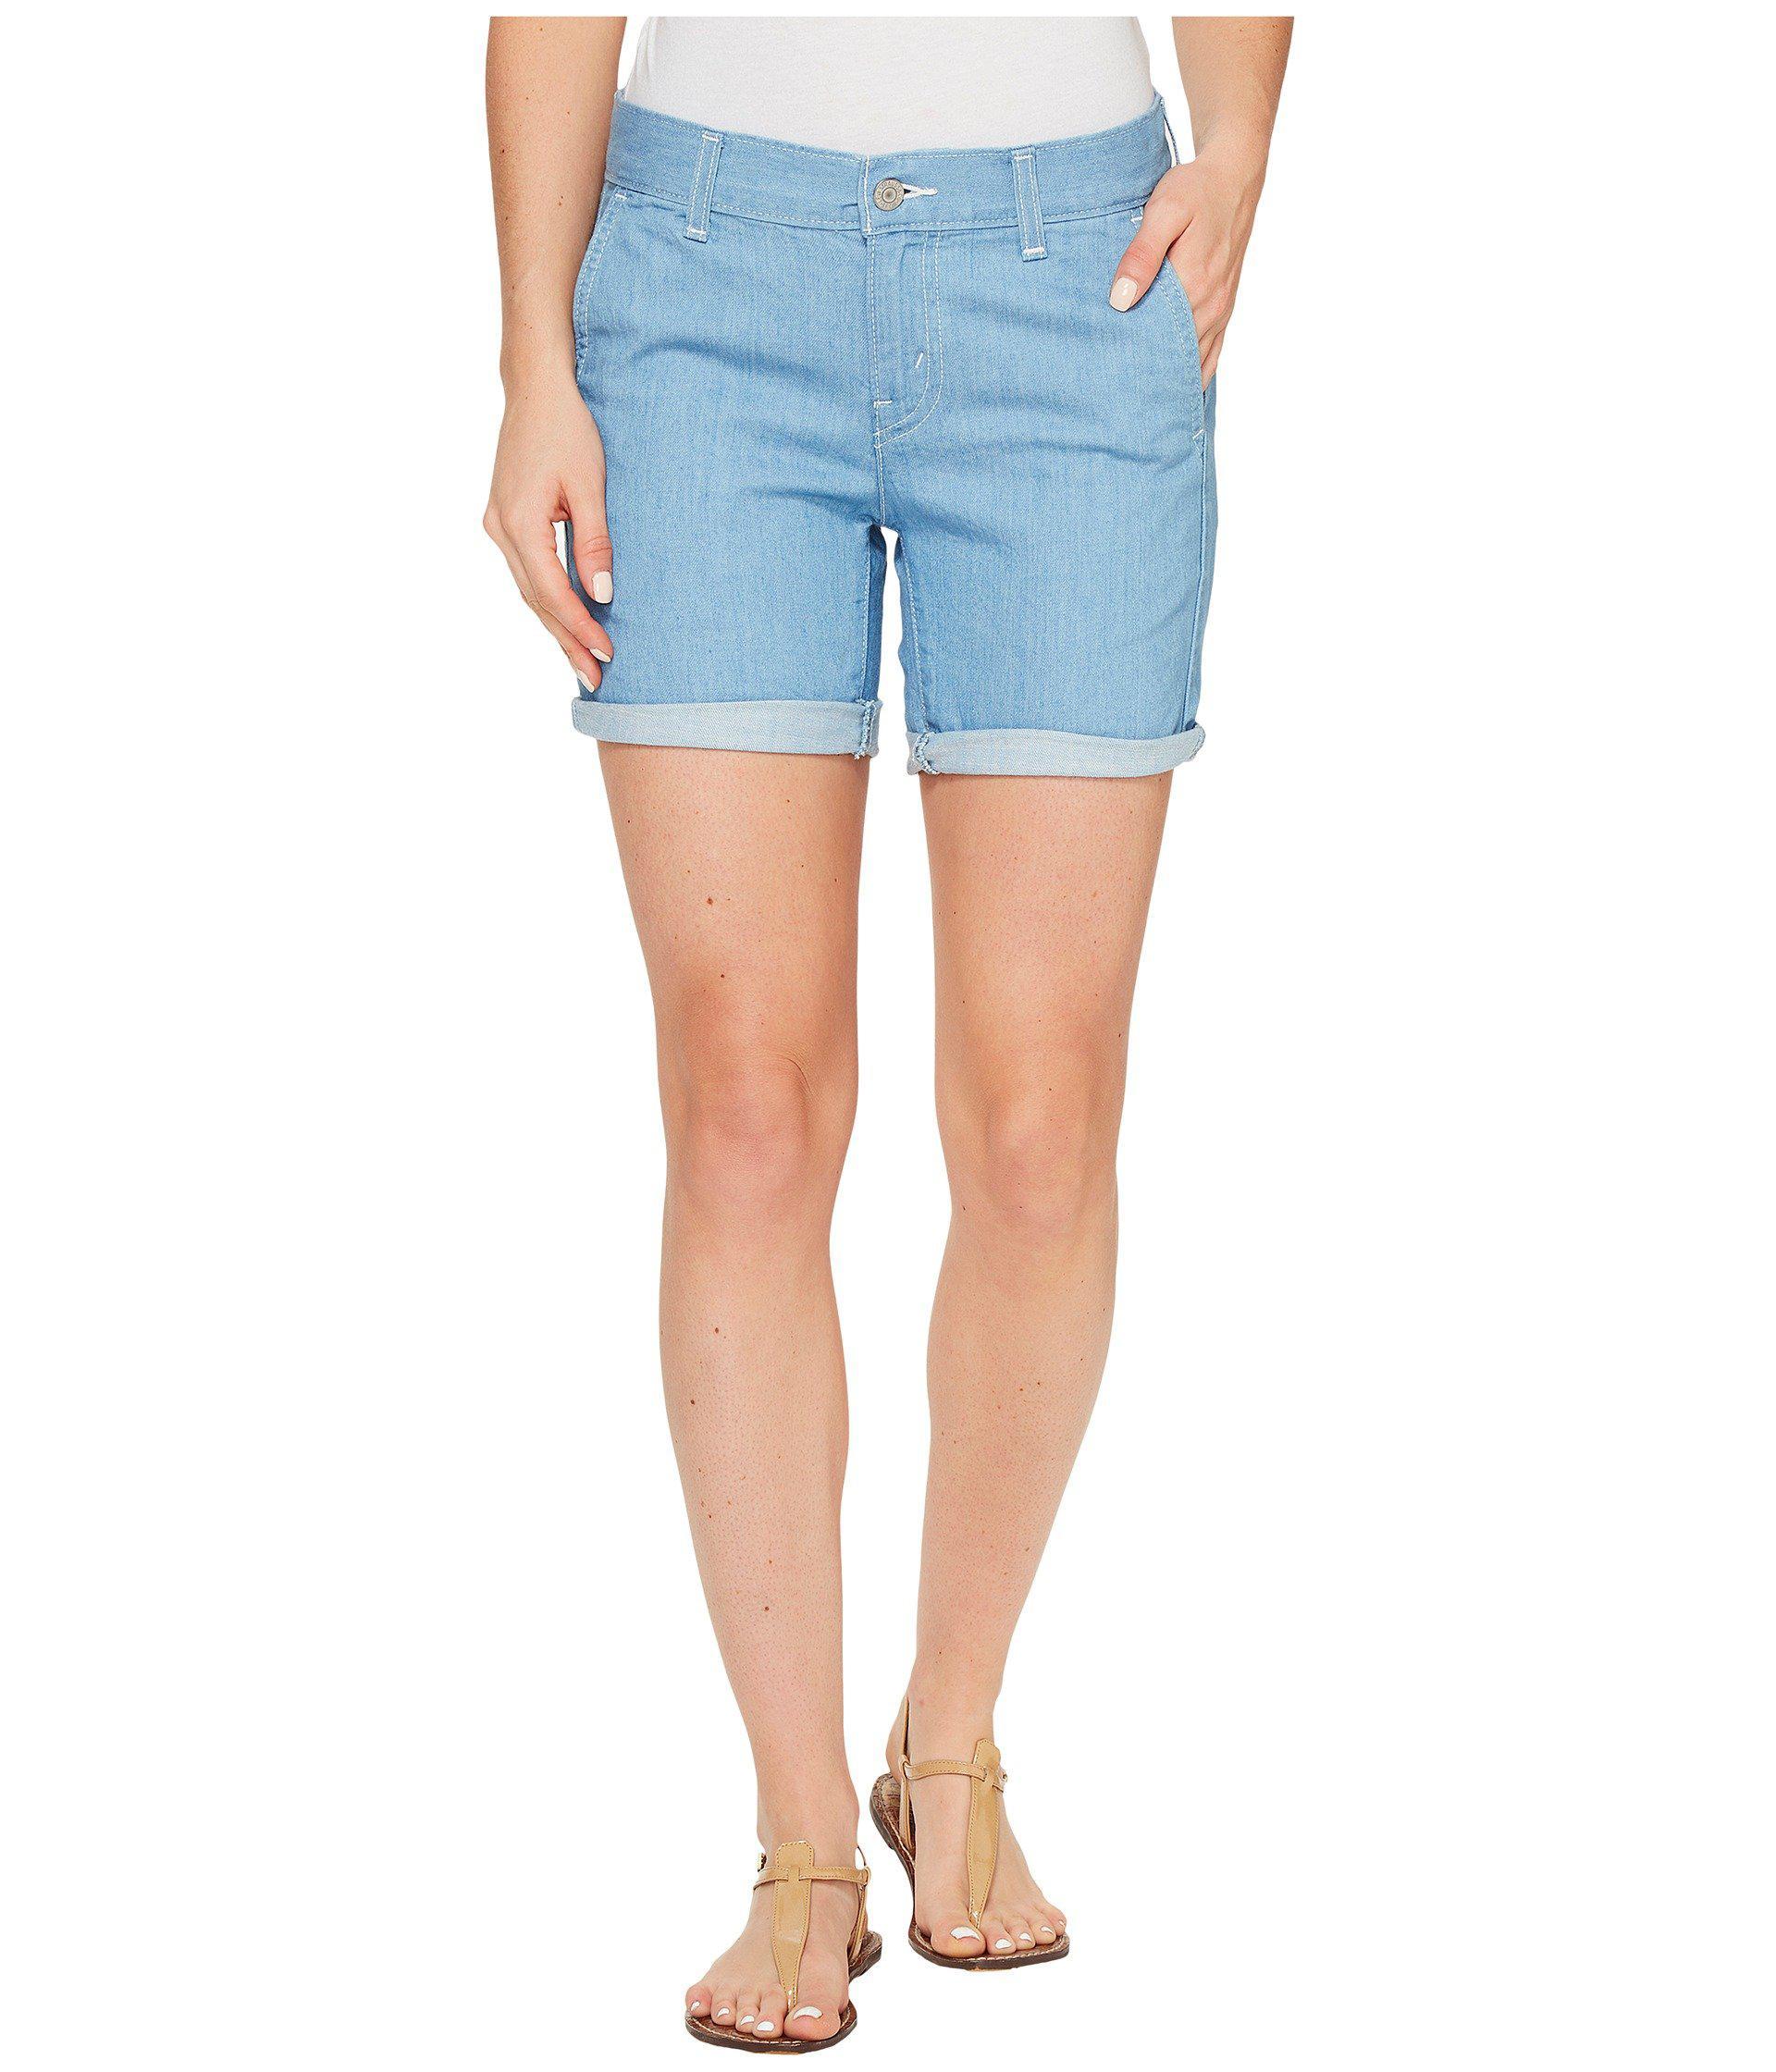 Levi's. Women's Blue Boyfriend Chino Shorts